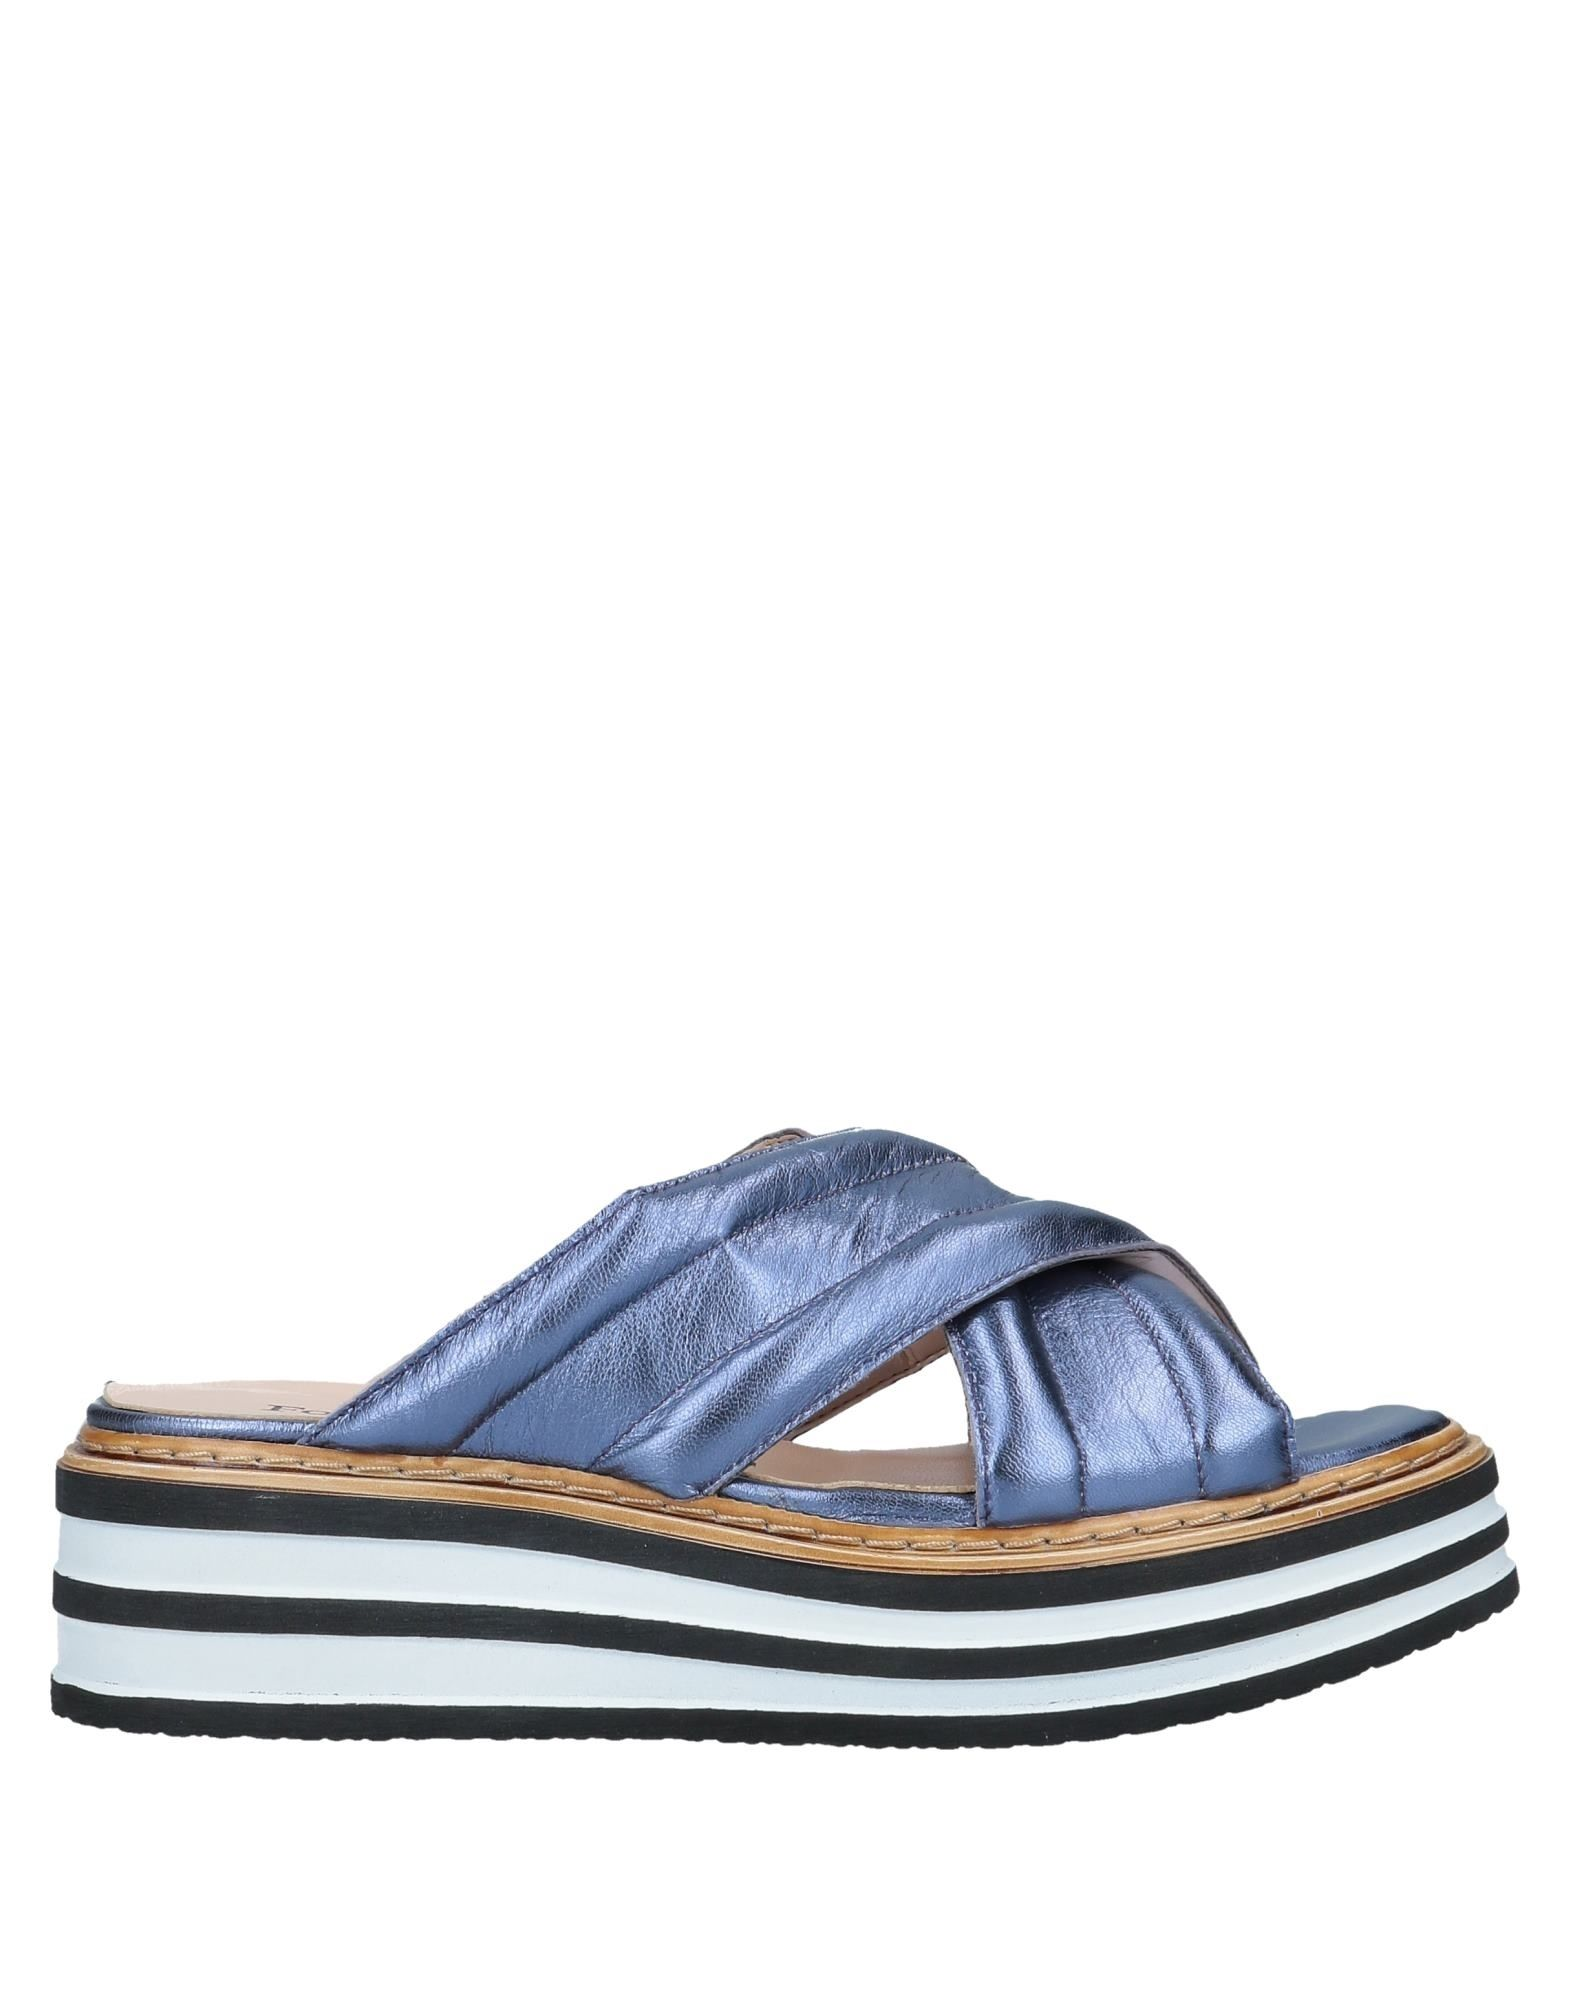 FORMENTINI | FORMENTINI Sandals 11442452 | Goxip